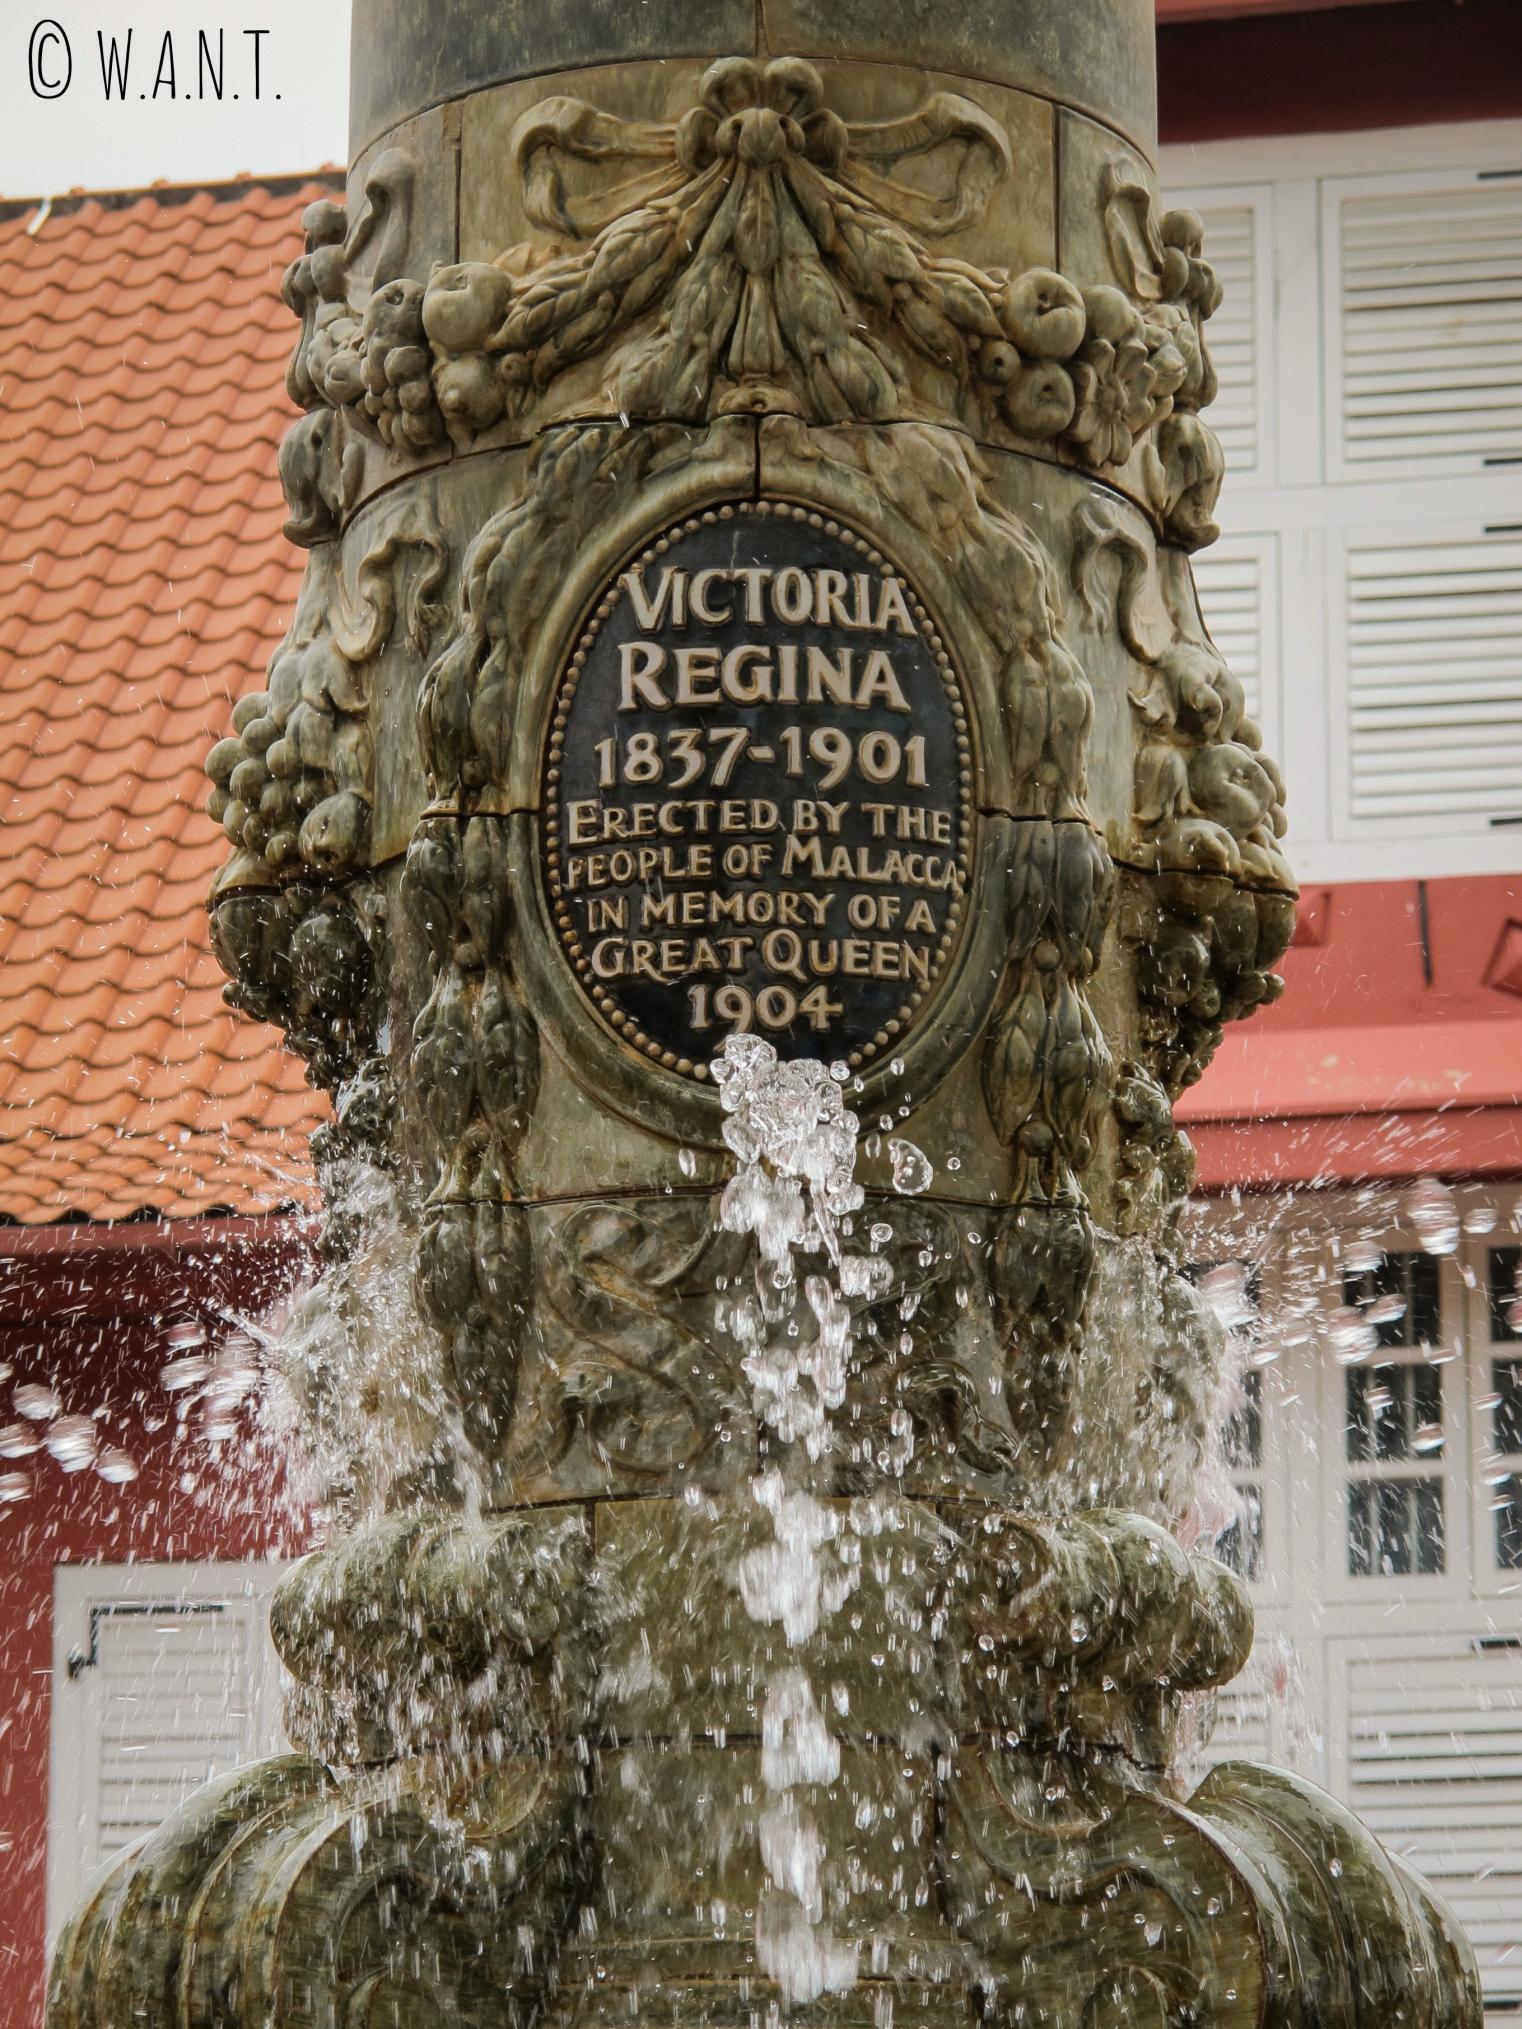 Gros plan sur la fontaine Queen Victoria de Malacca